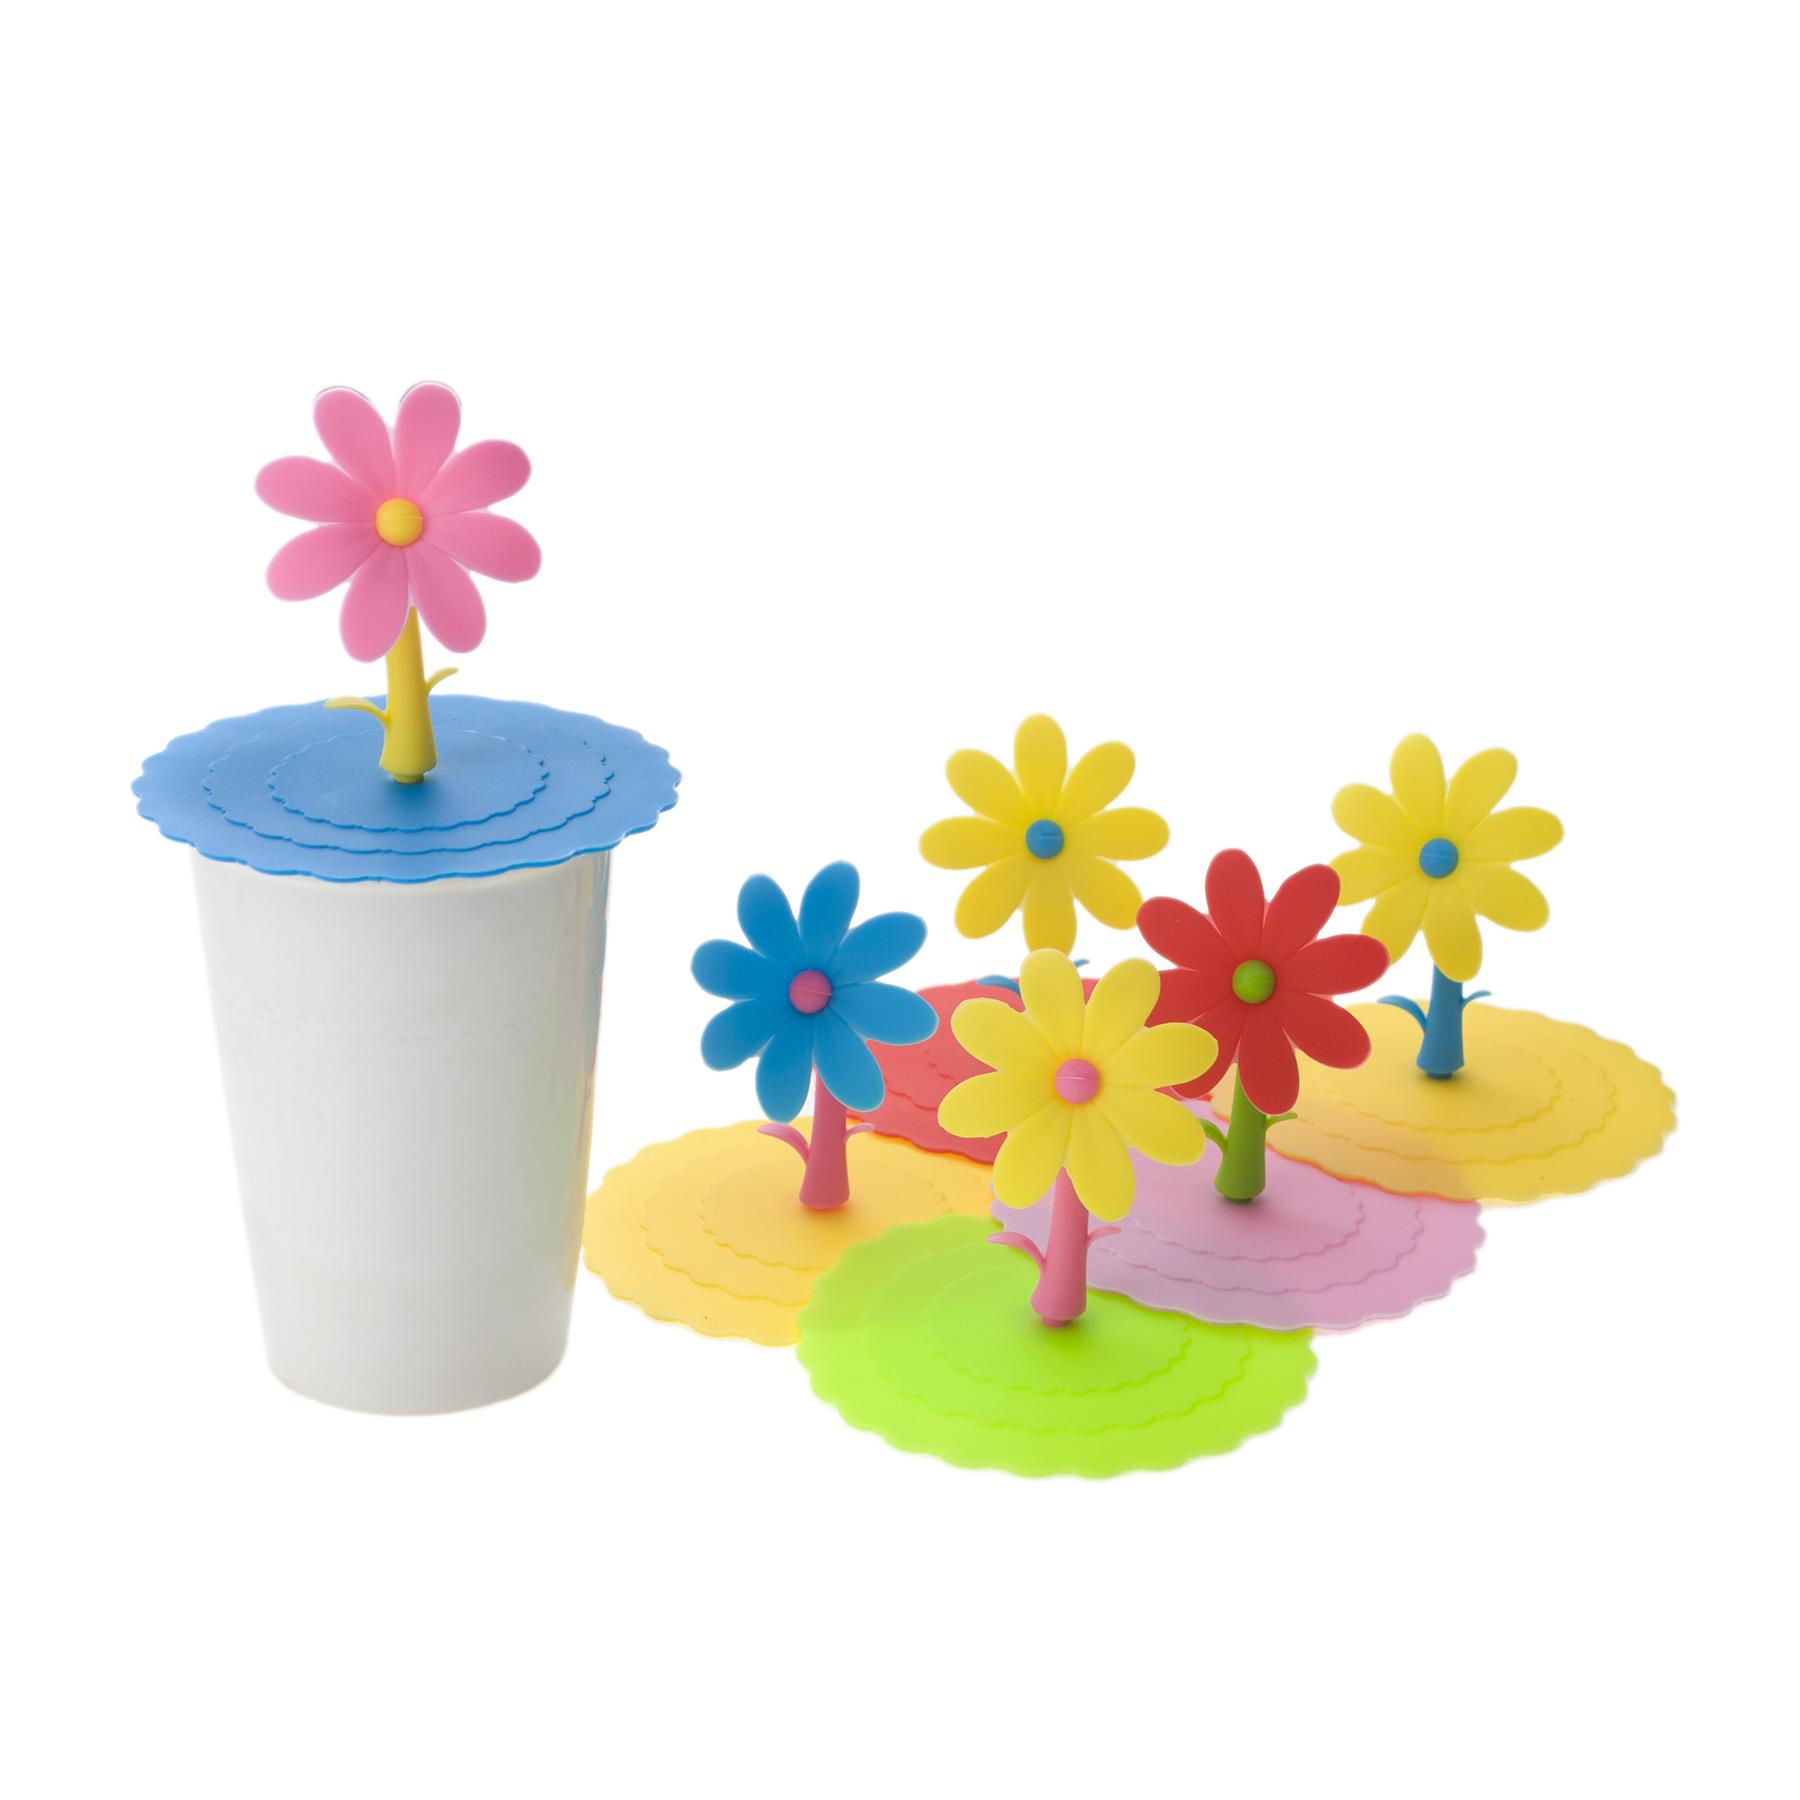 Aspire Cute Flower Silicone Drink Cup Lids, Creative Mug Cover Airtight Seal - 1 Pack